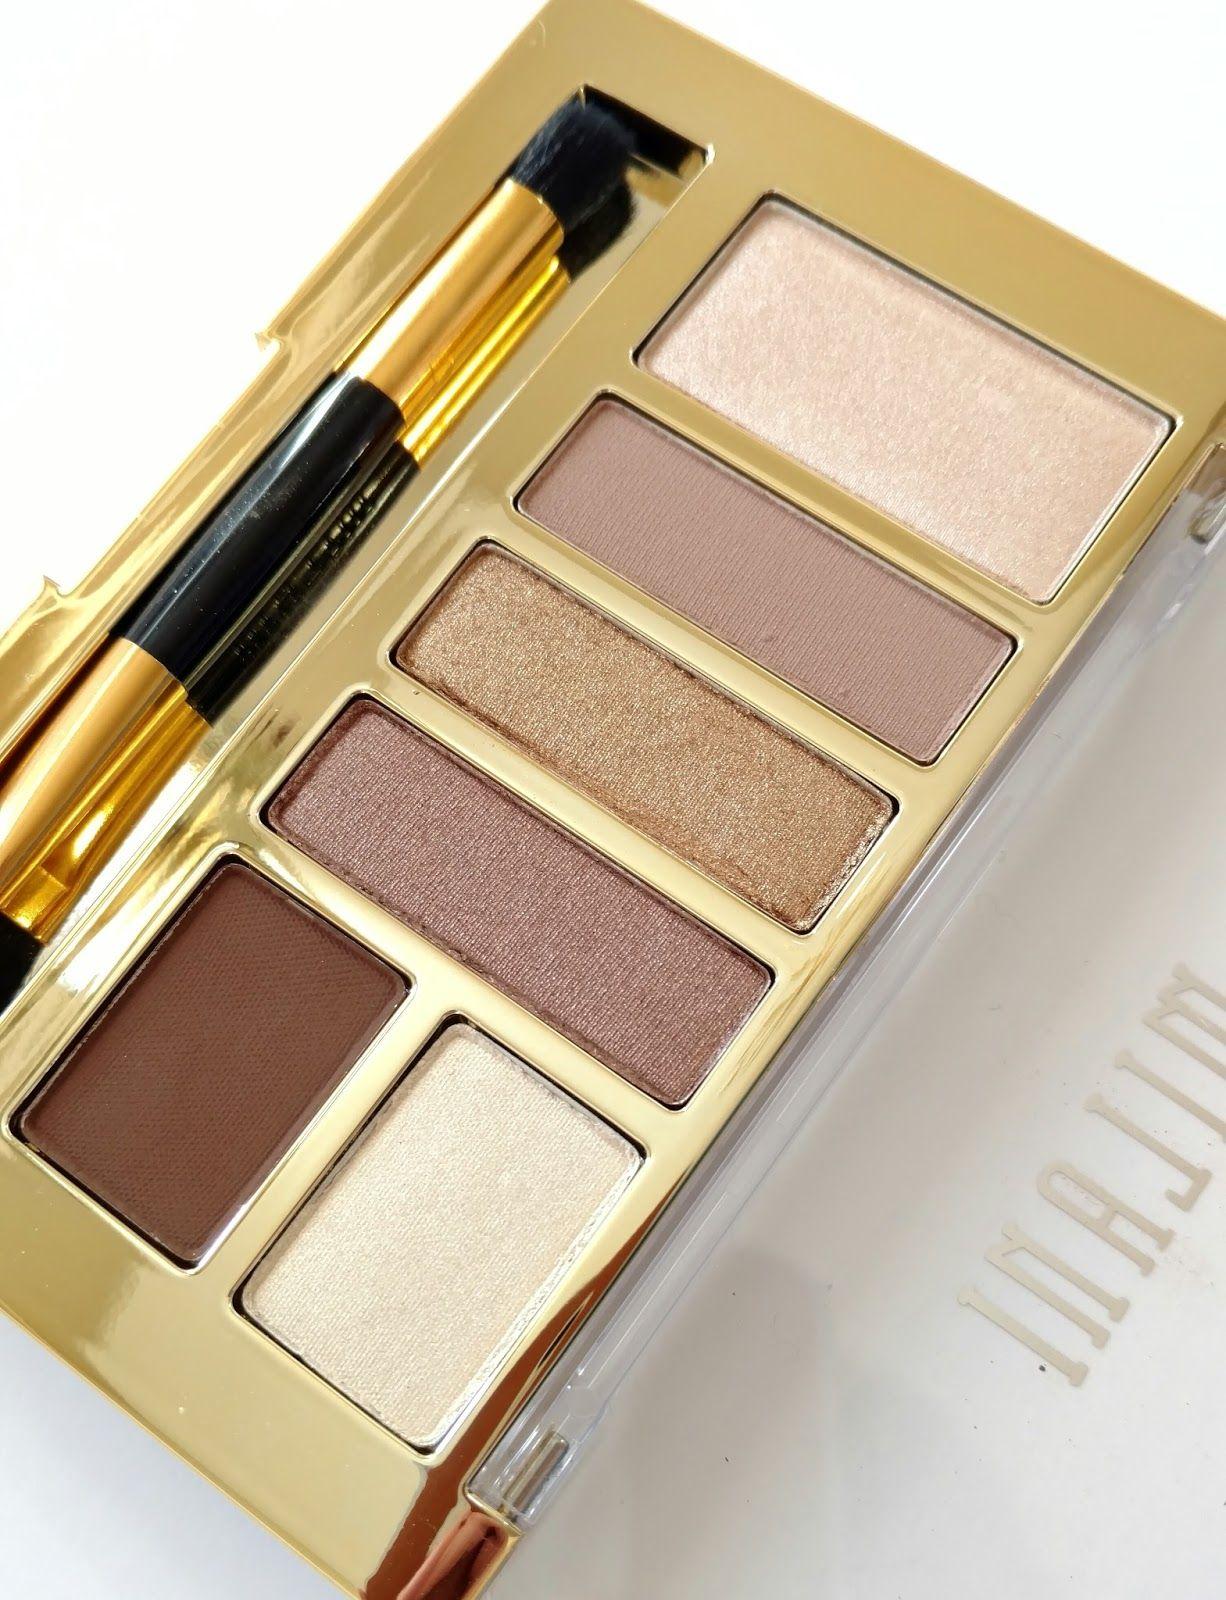 Good Drugstore Eyeshadow Palettes: Milani Everyday Eyes Eyeshadow Palette Review